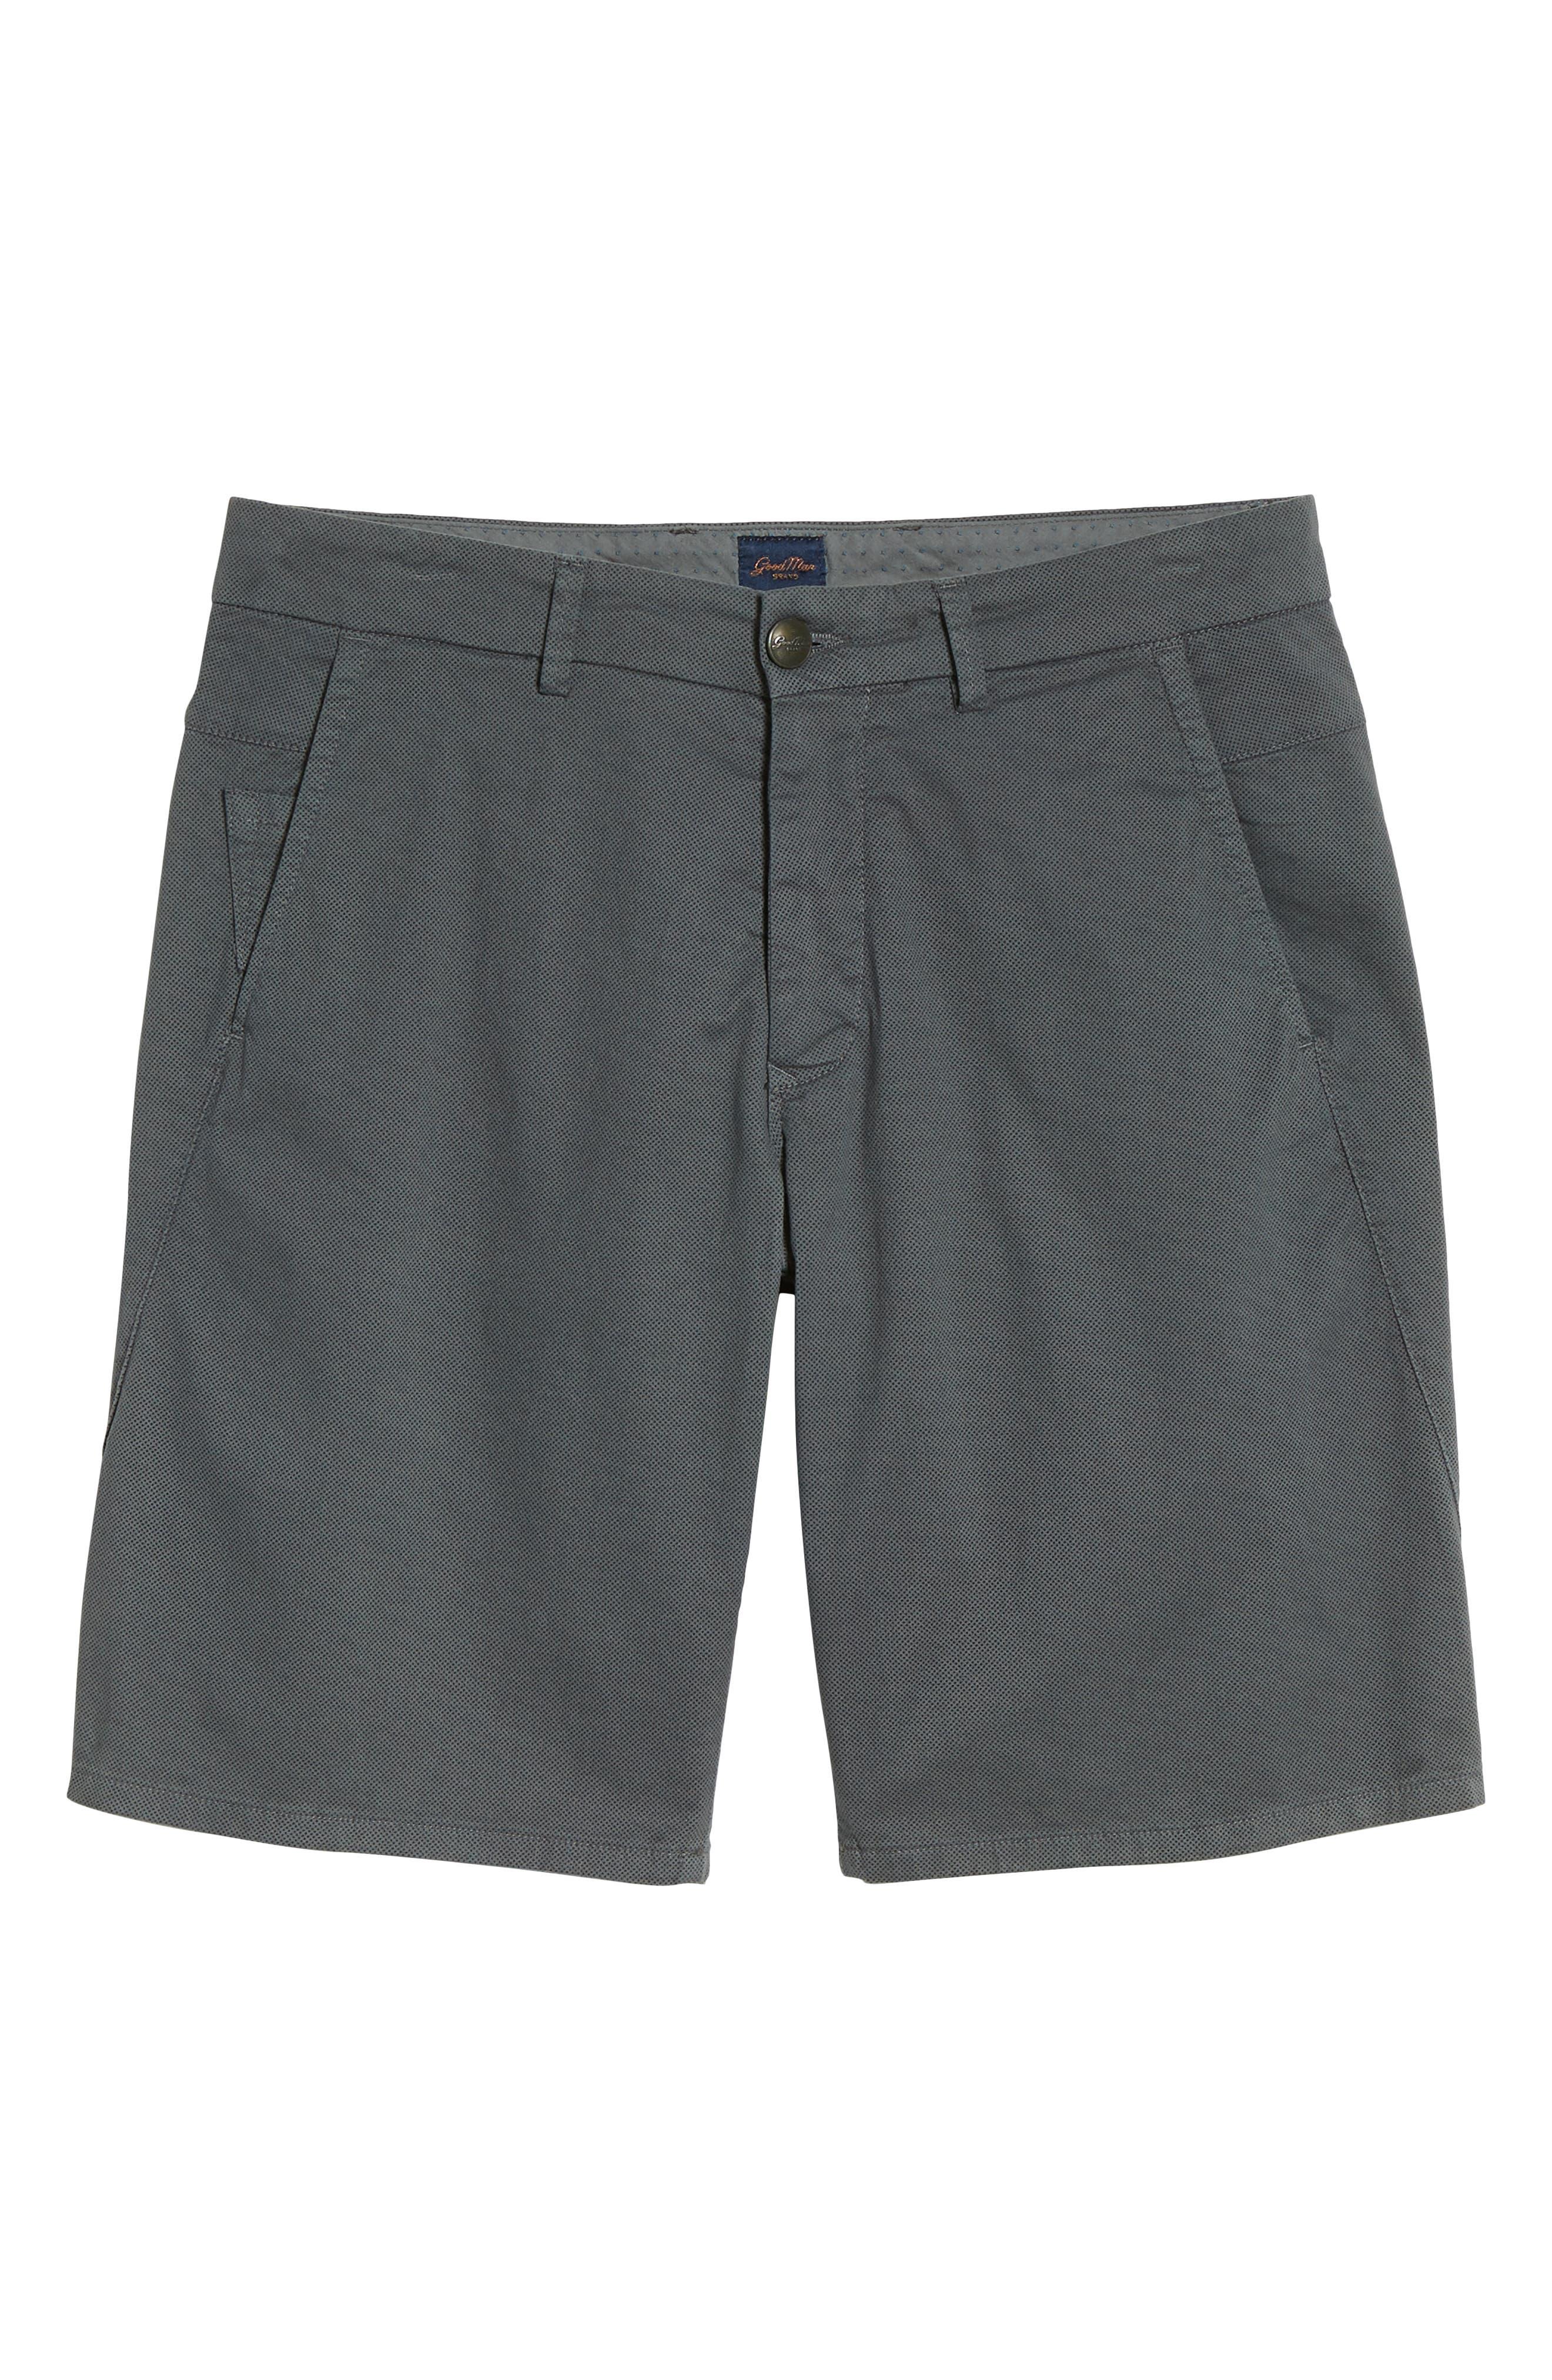 Wrap Microdot Stretch Chino Shorts,                             Alternate thumbnail 6, color,                             051